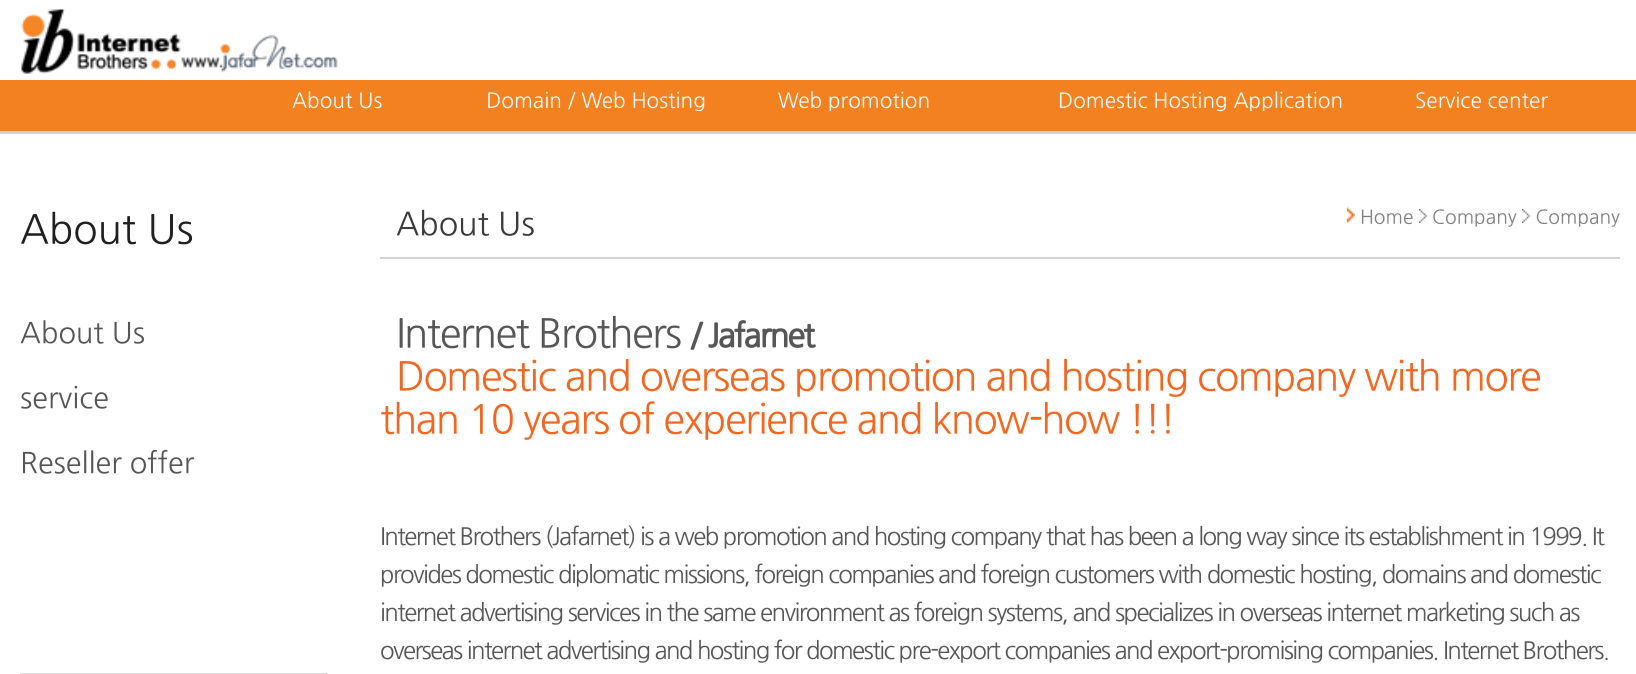 Internet Brothers (Jafarnet)